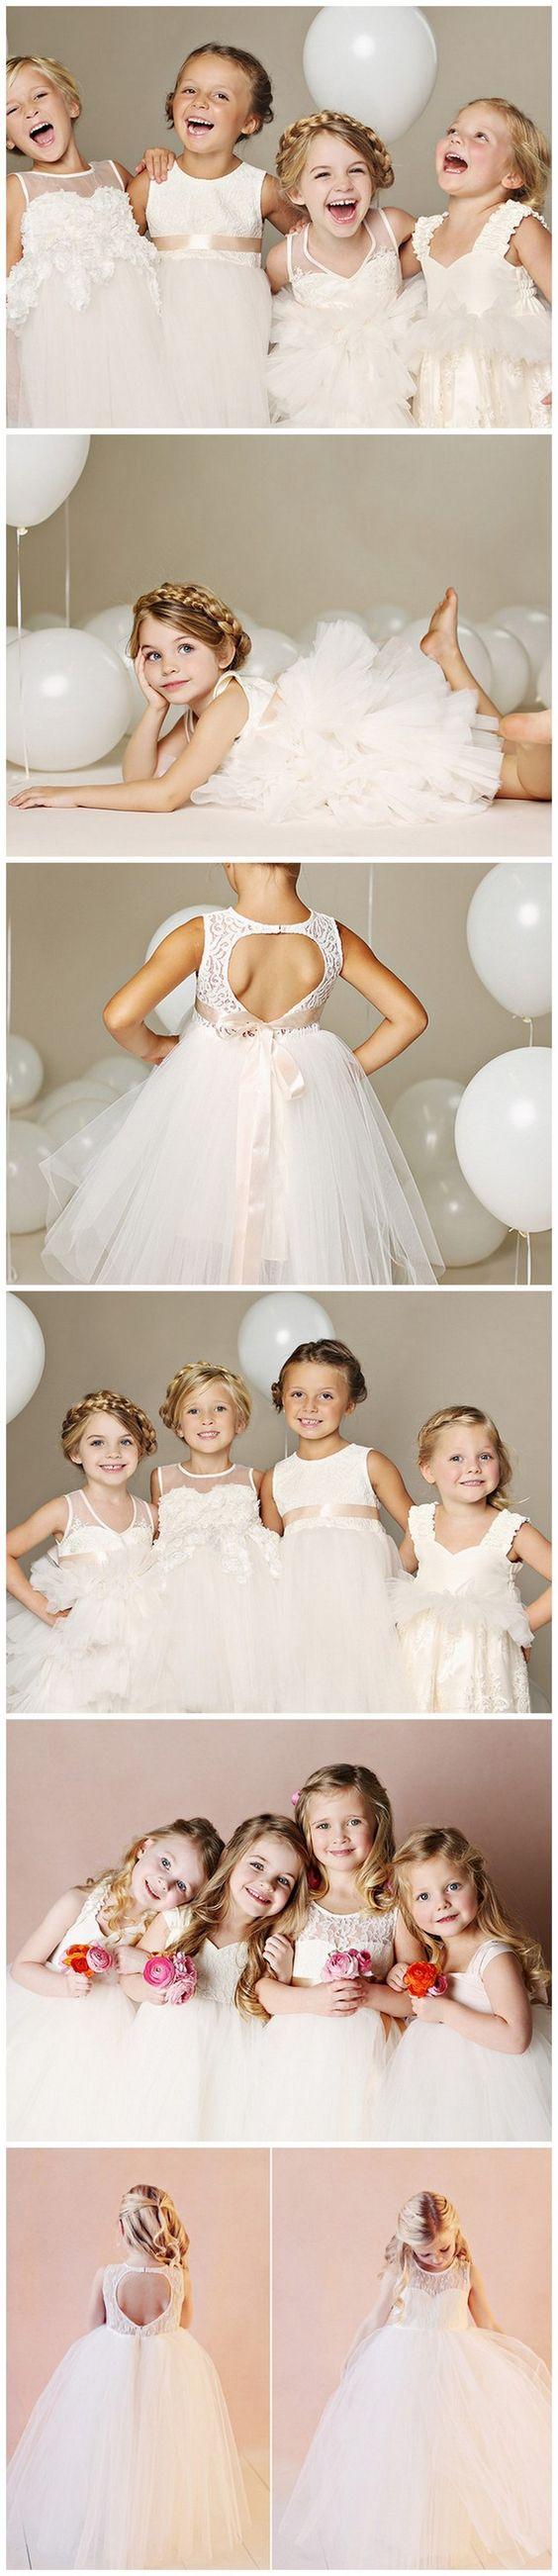 Darling flower girl dresses fattie pie wedding braid crown and